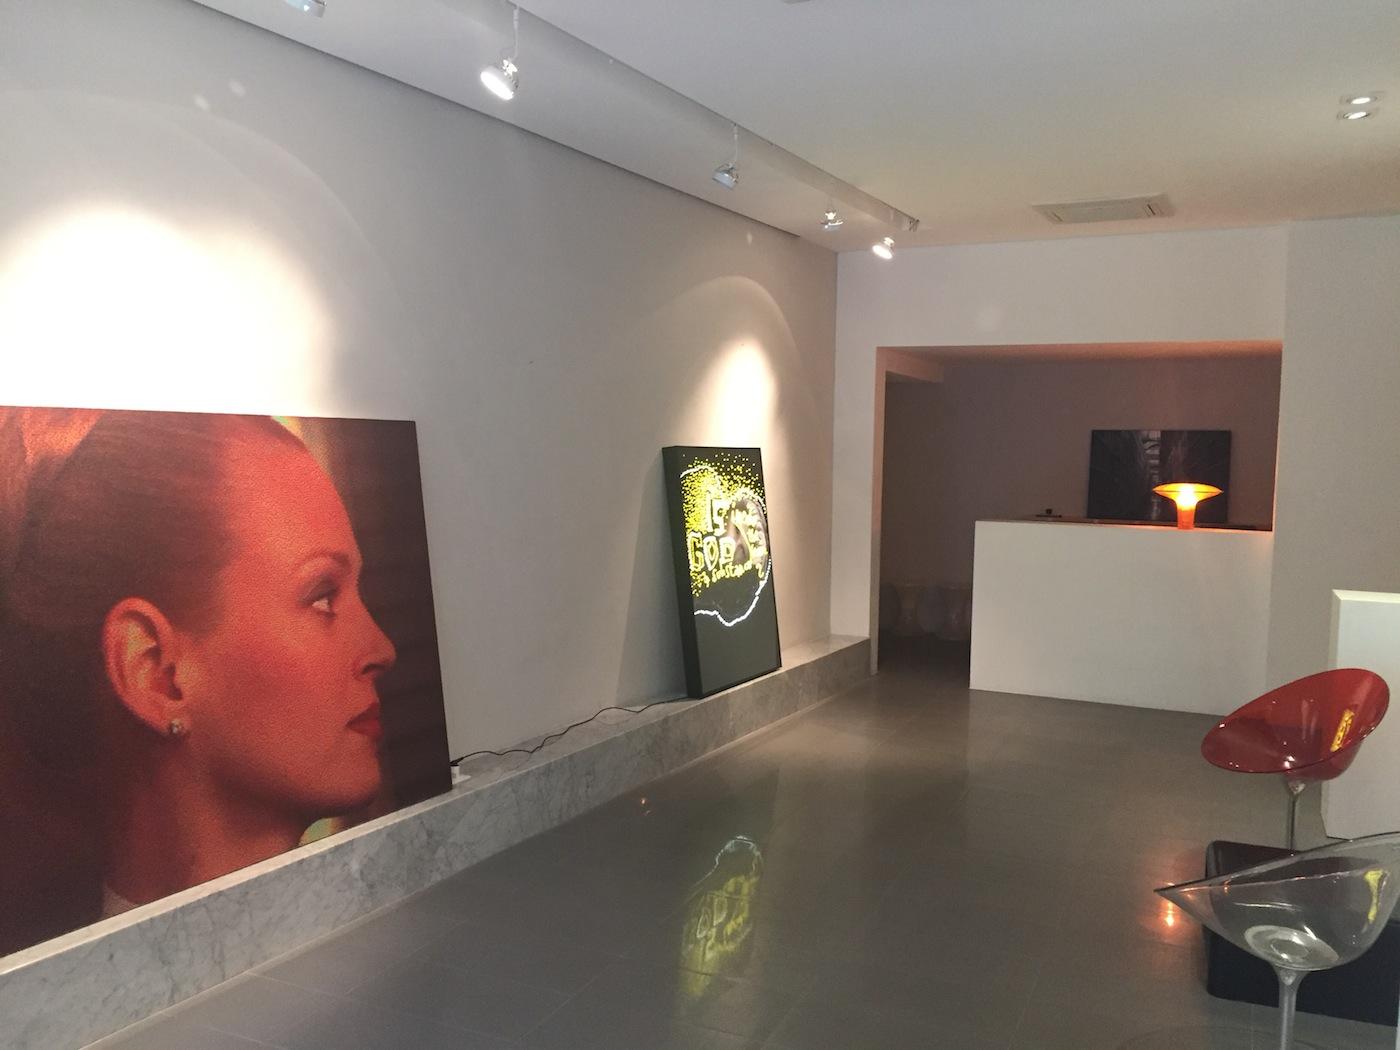 Veduta interna Galleria Guidi&Schoen Arte Contemporanea, Genova